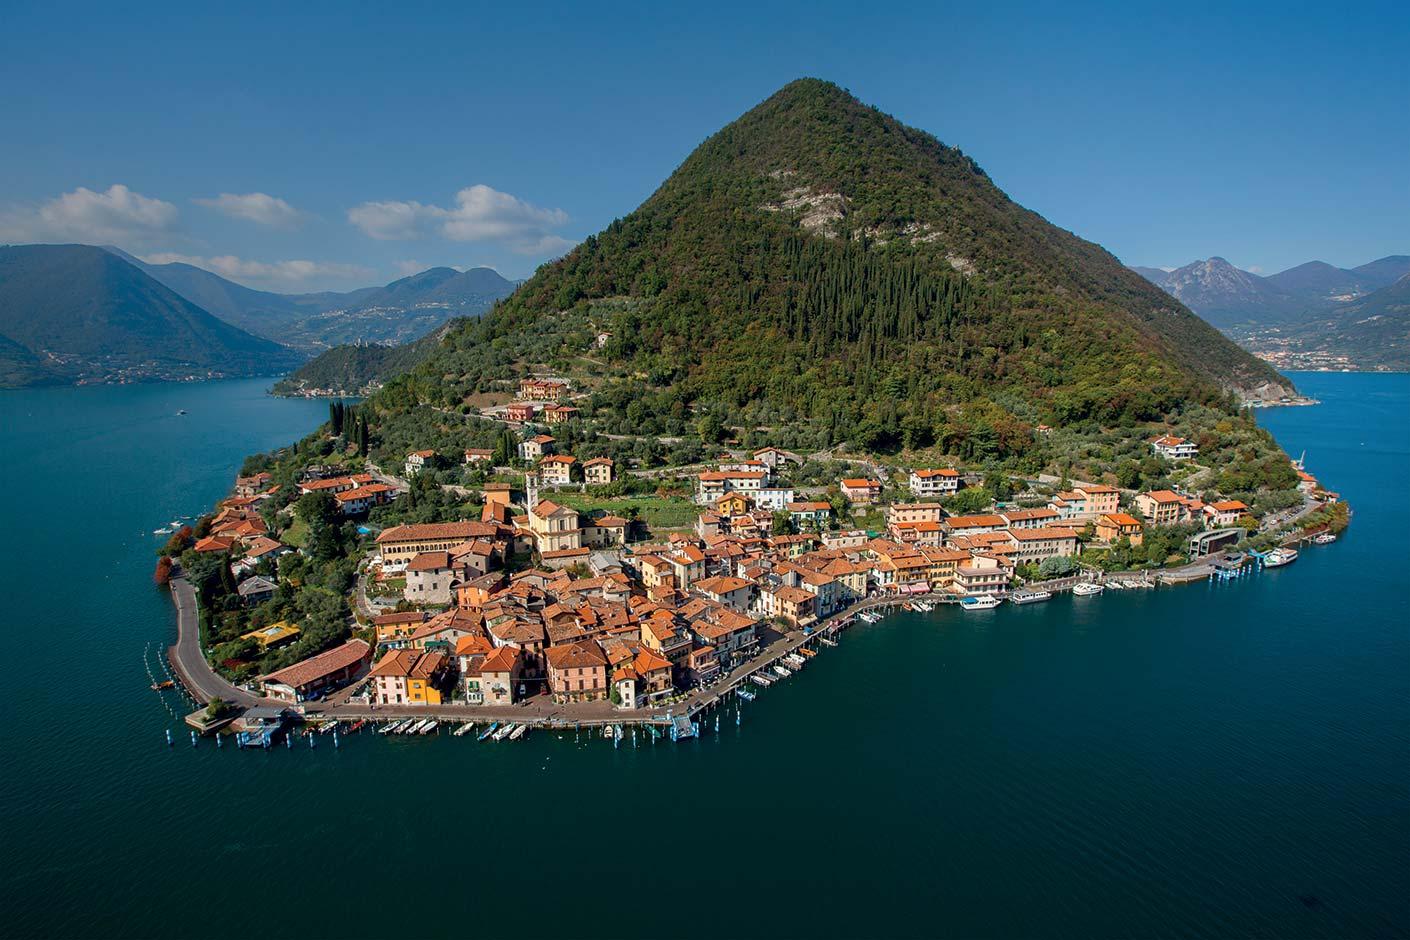 montisola-o-maior-lago-illa-en-europa-secret-world